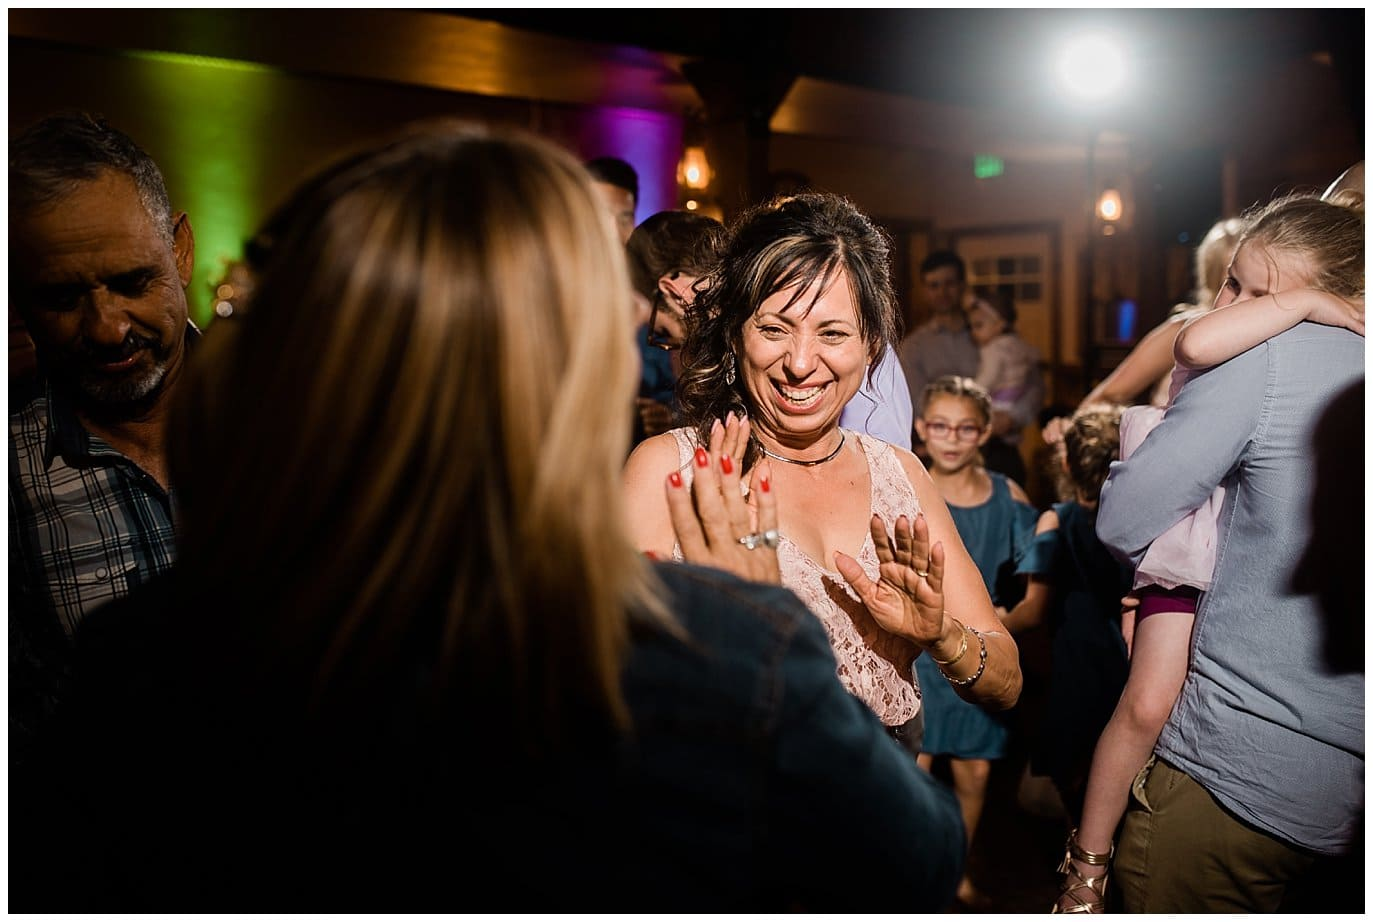 wedding dancing in barn at Deer Creek Valley Ranch wedding by Colorado Wedding Photographer Jennie Crate Photographer